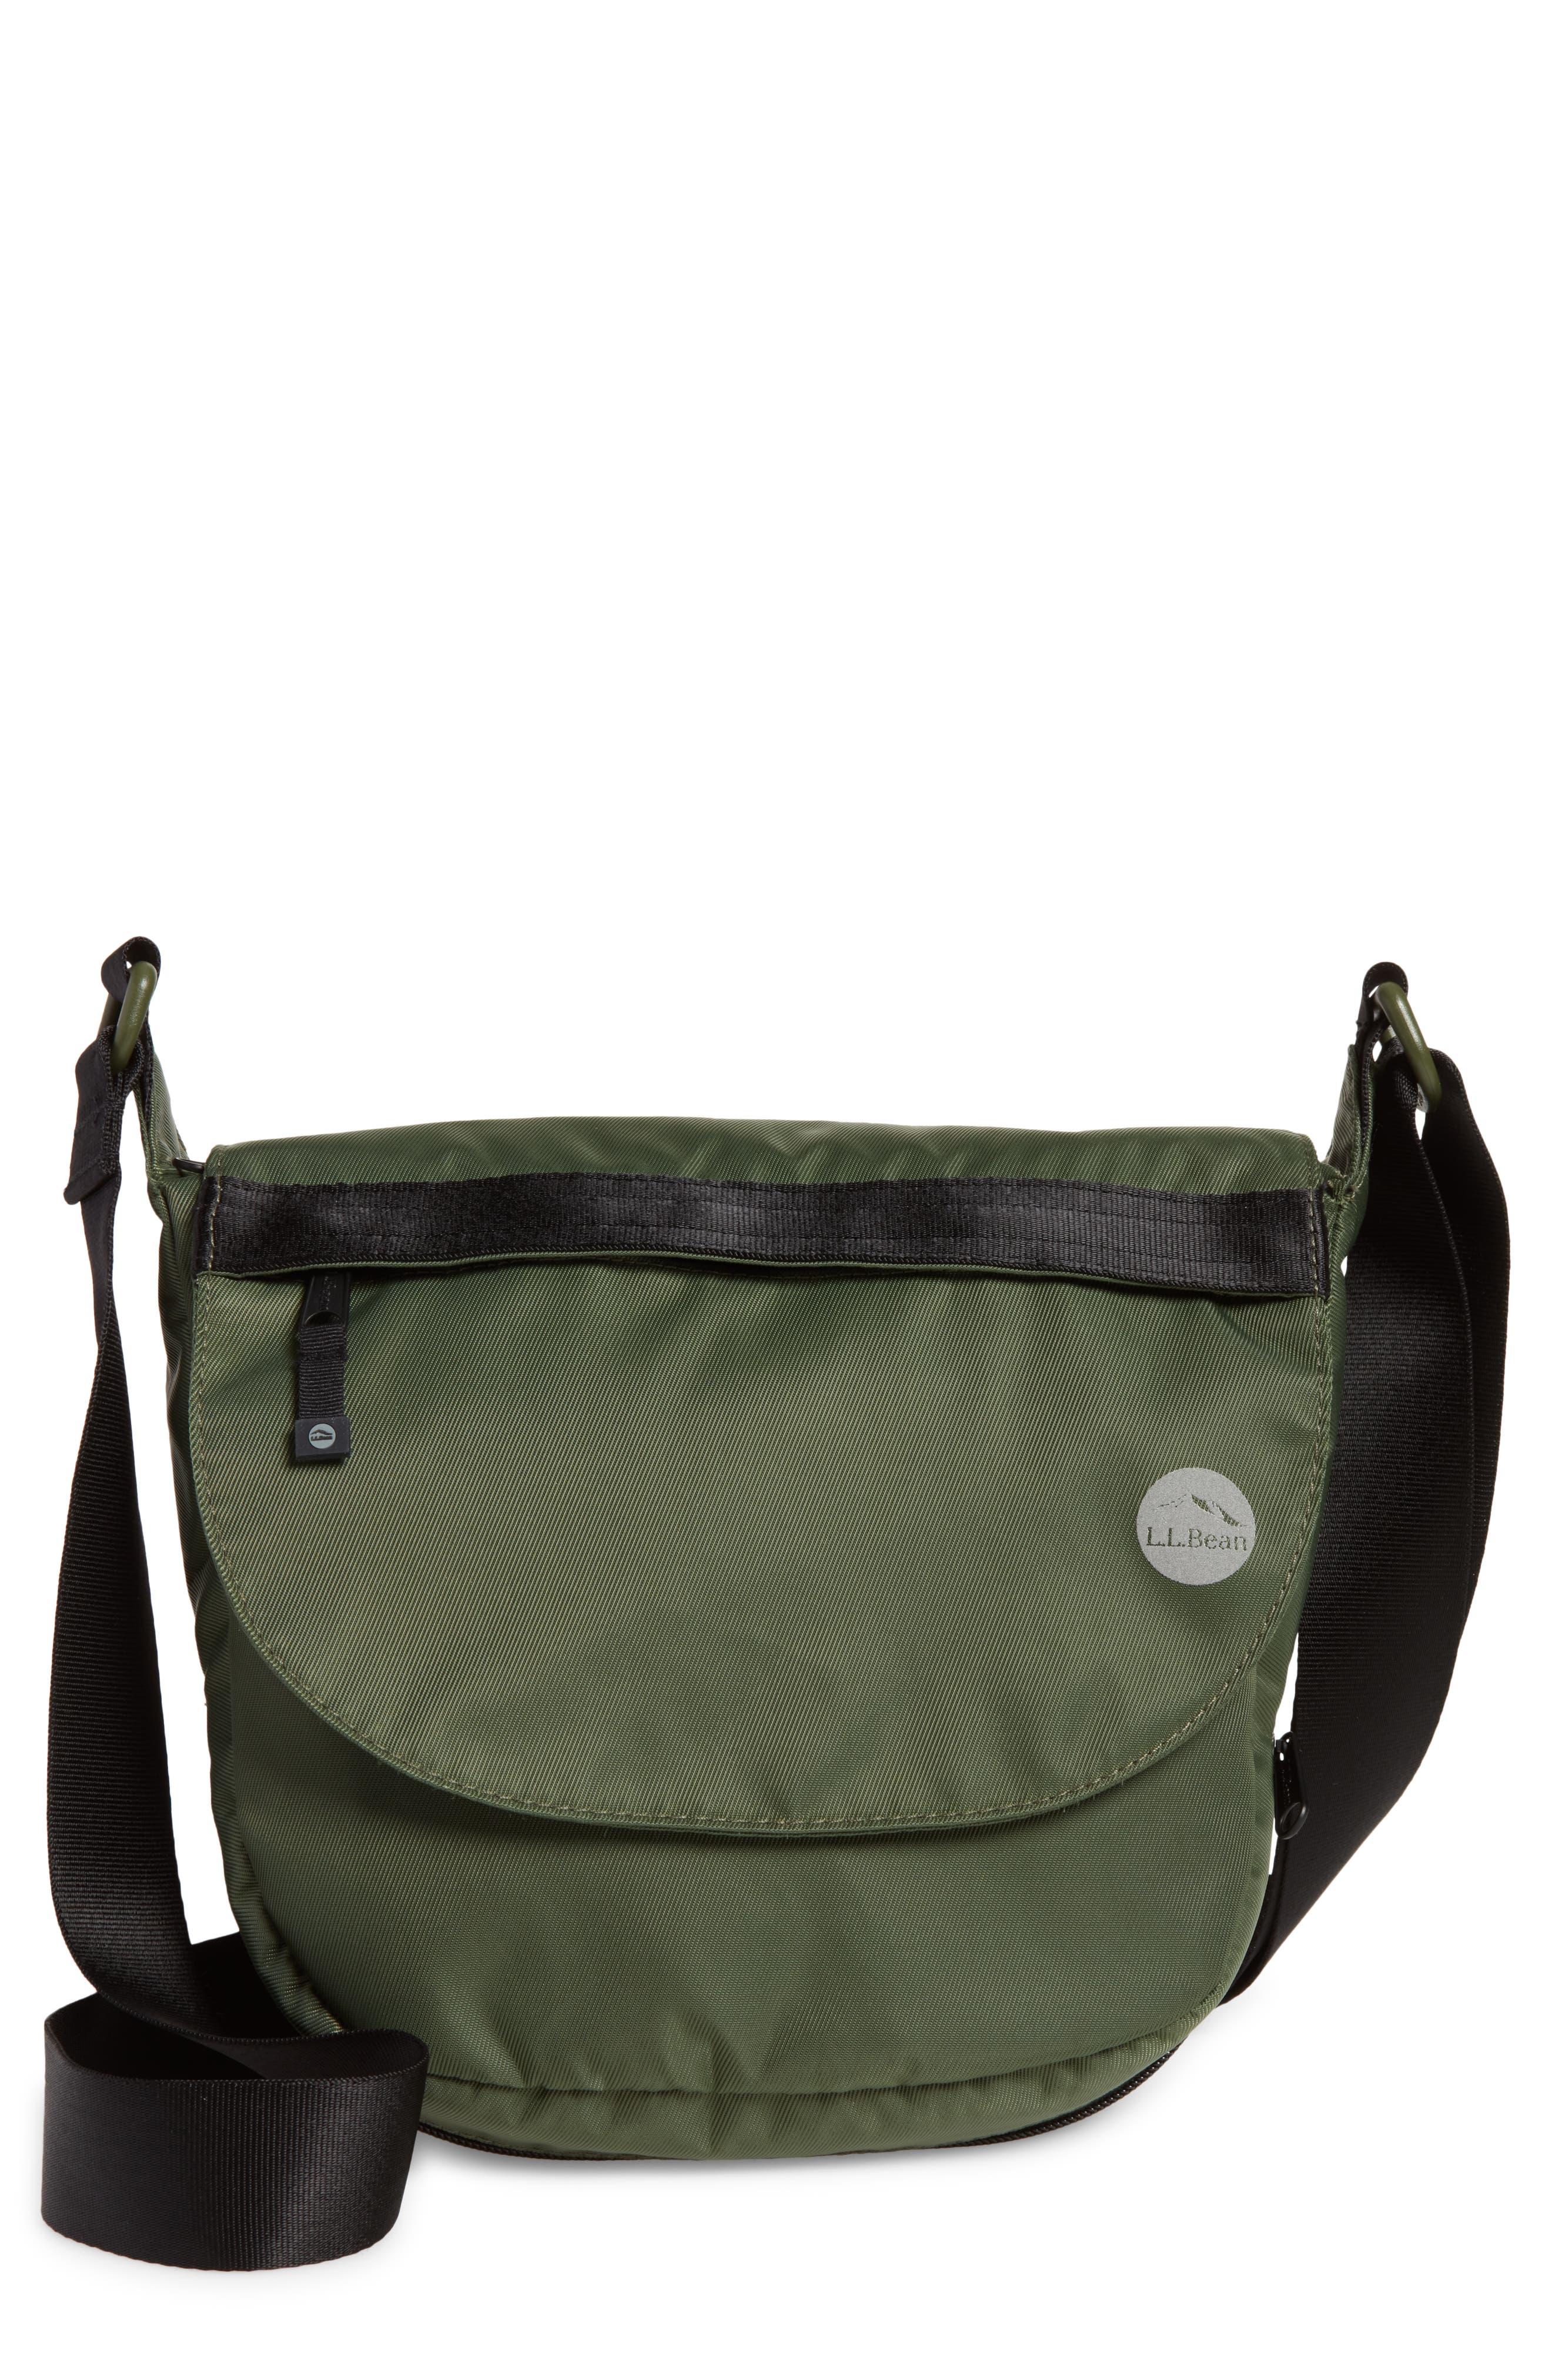 L.l. Bean Boundless Crossbody Bag